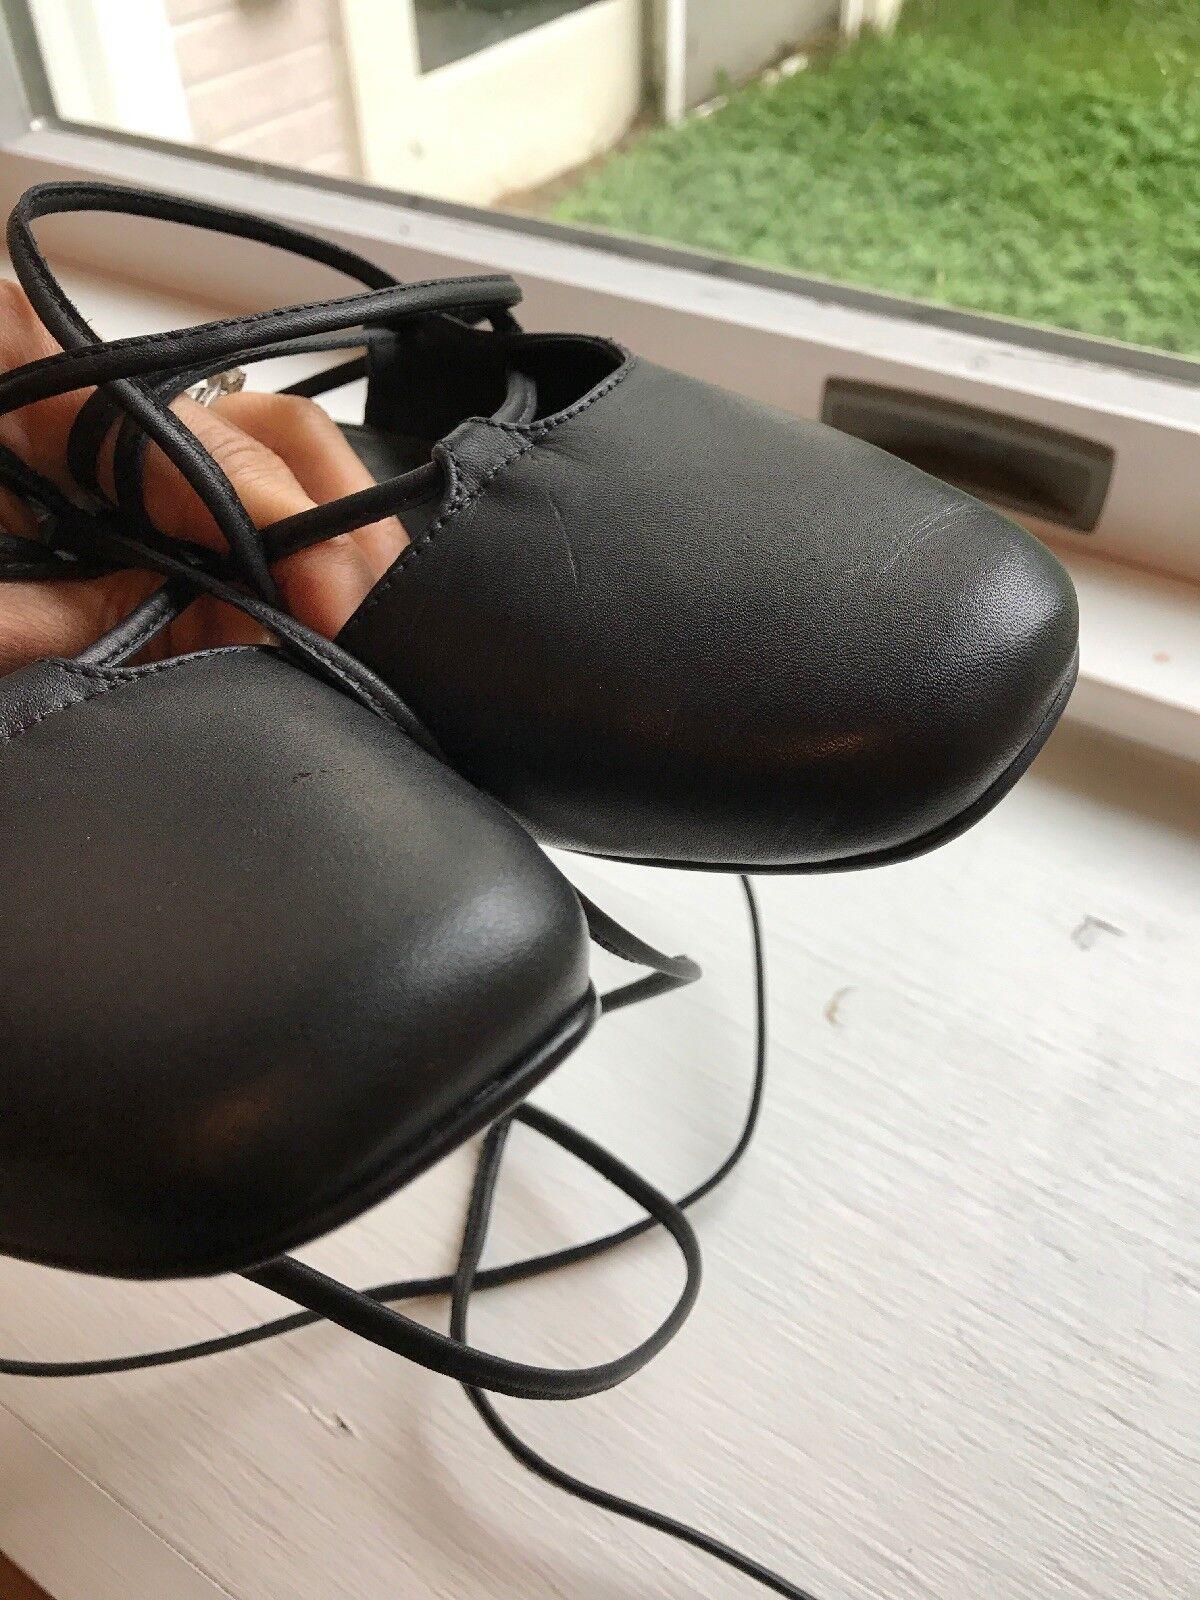 Tibi Lace up Ballerina Flats, Sz 35 Black Black Black Leather NWOB 2658a8